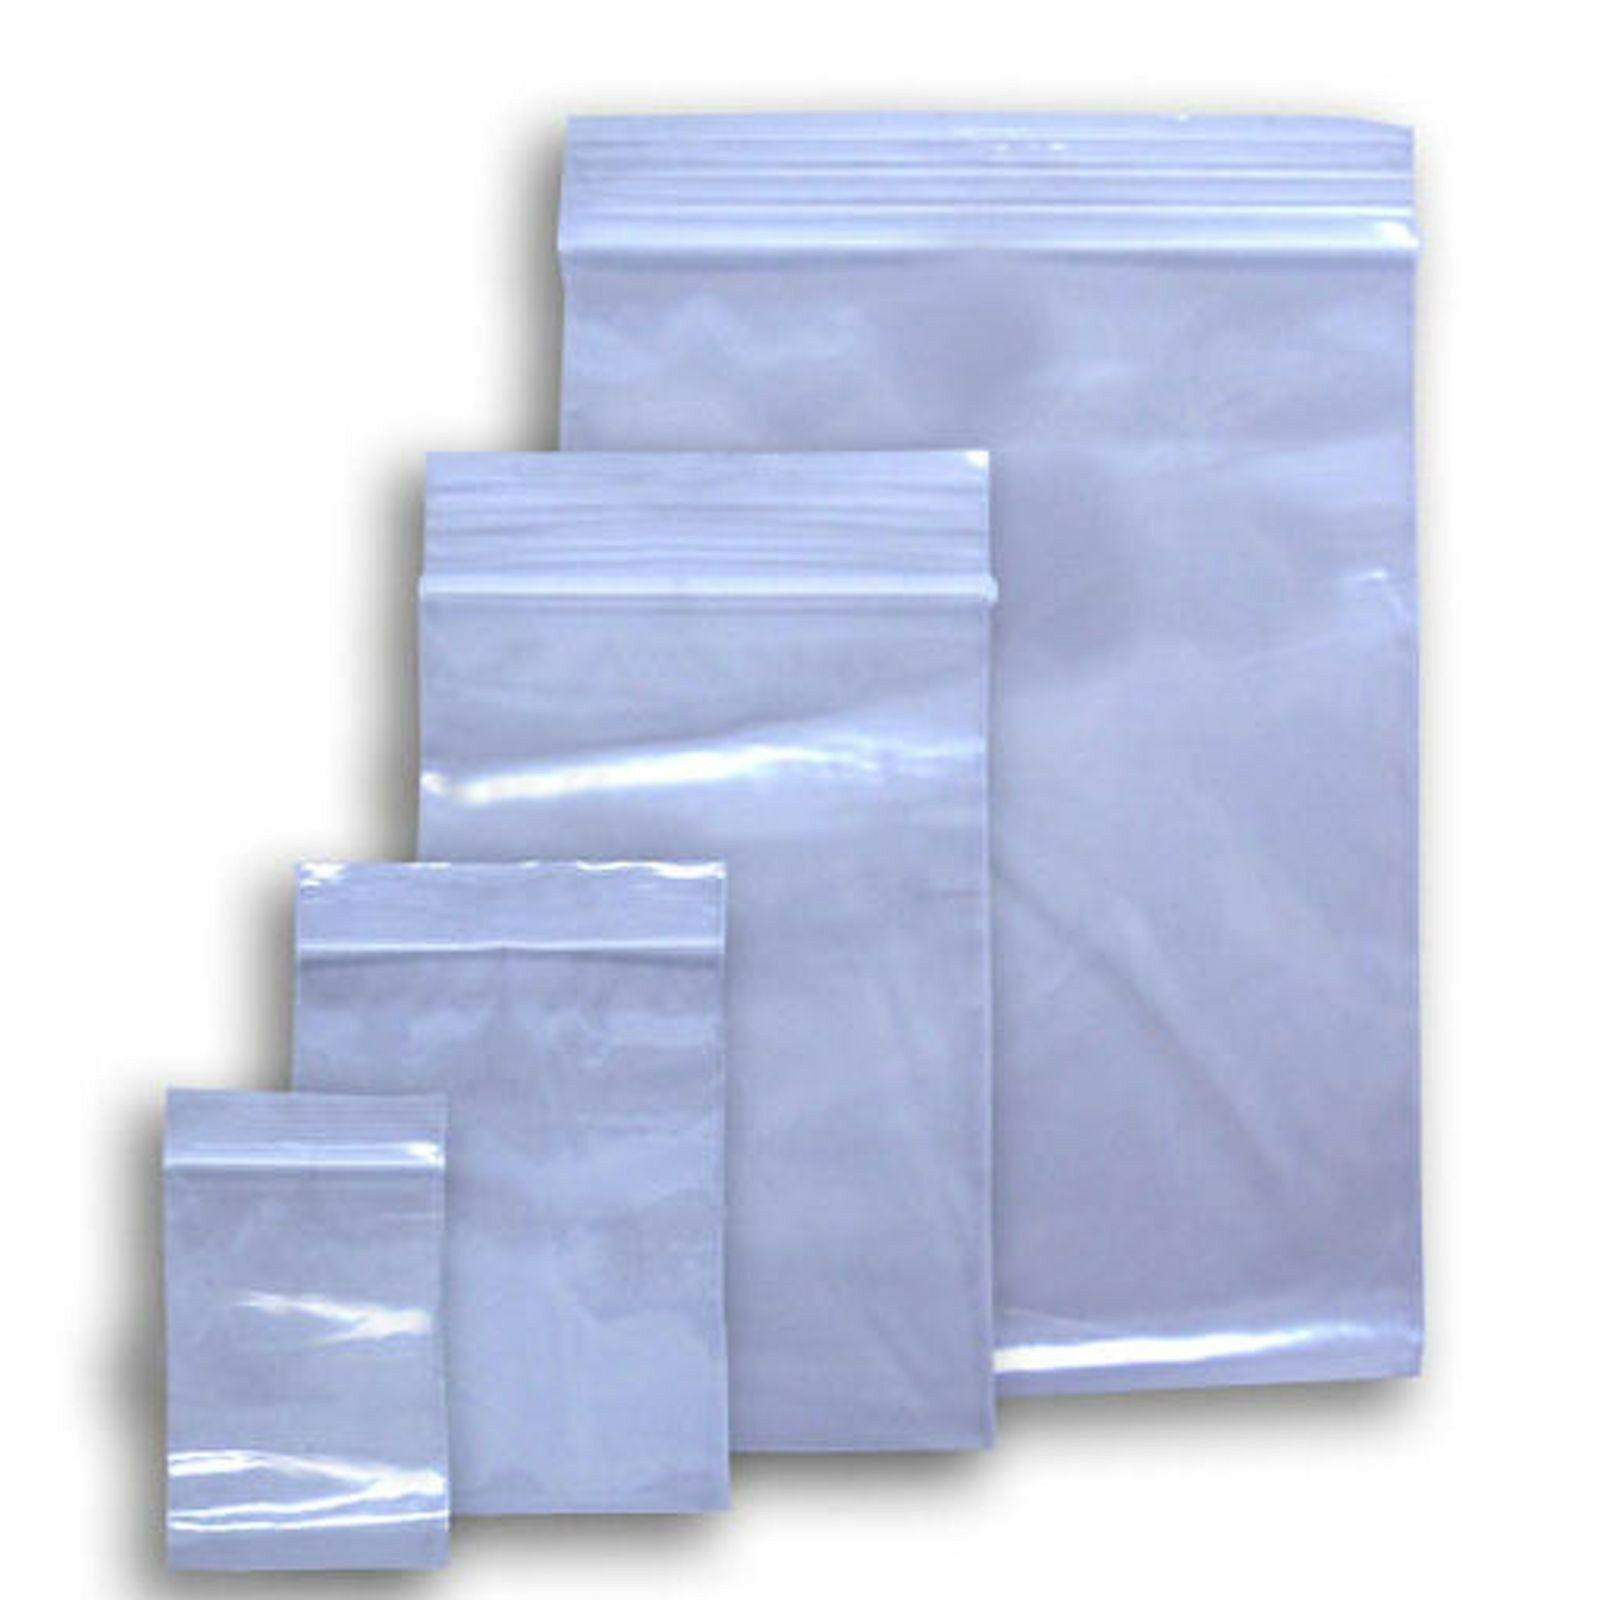 "Reclosable Poly Bag - 2"" x 3"" -4 mil"